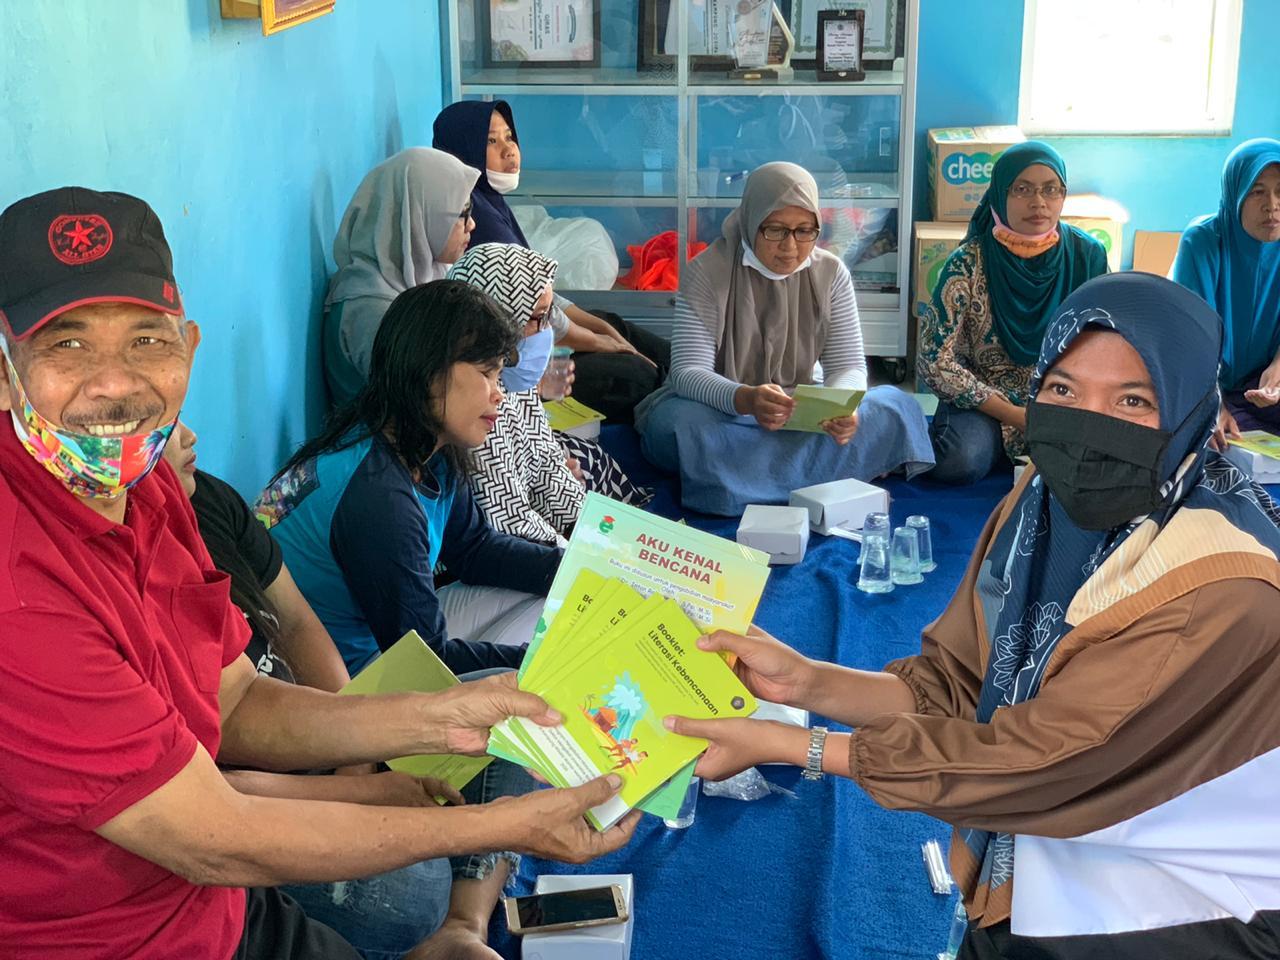 Tim pengabdian masyarakat Jurusan Psikologi, Fakultas Ilmu Sosial dan Ilmu Politik, Universitas Brawijaya Malang melakukan penyuluhan langsung kepada anak-anak tentang kebencanaan di Kampung Warna-Warni Jodipan.